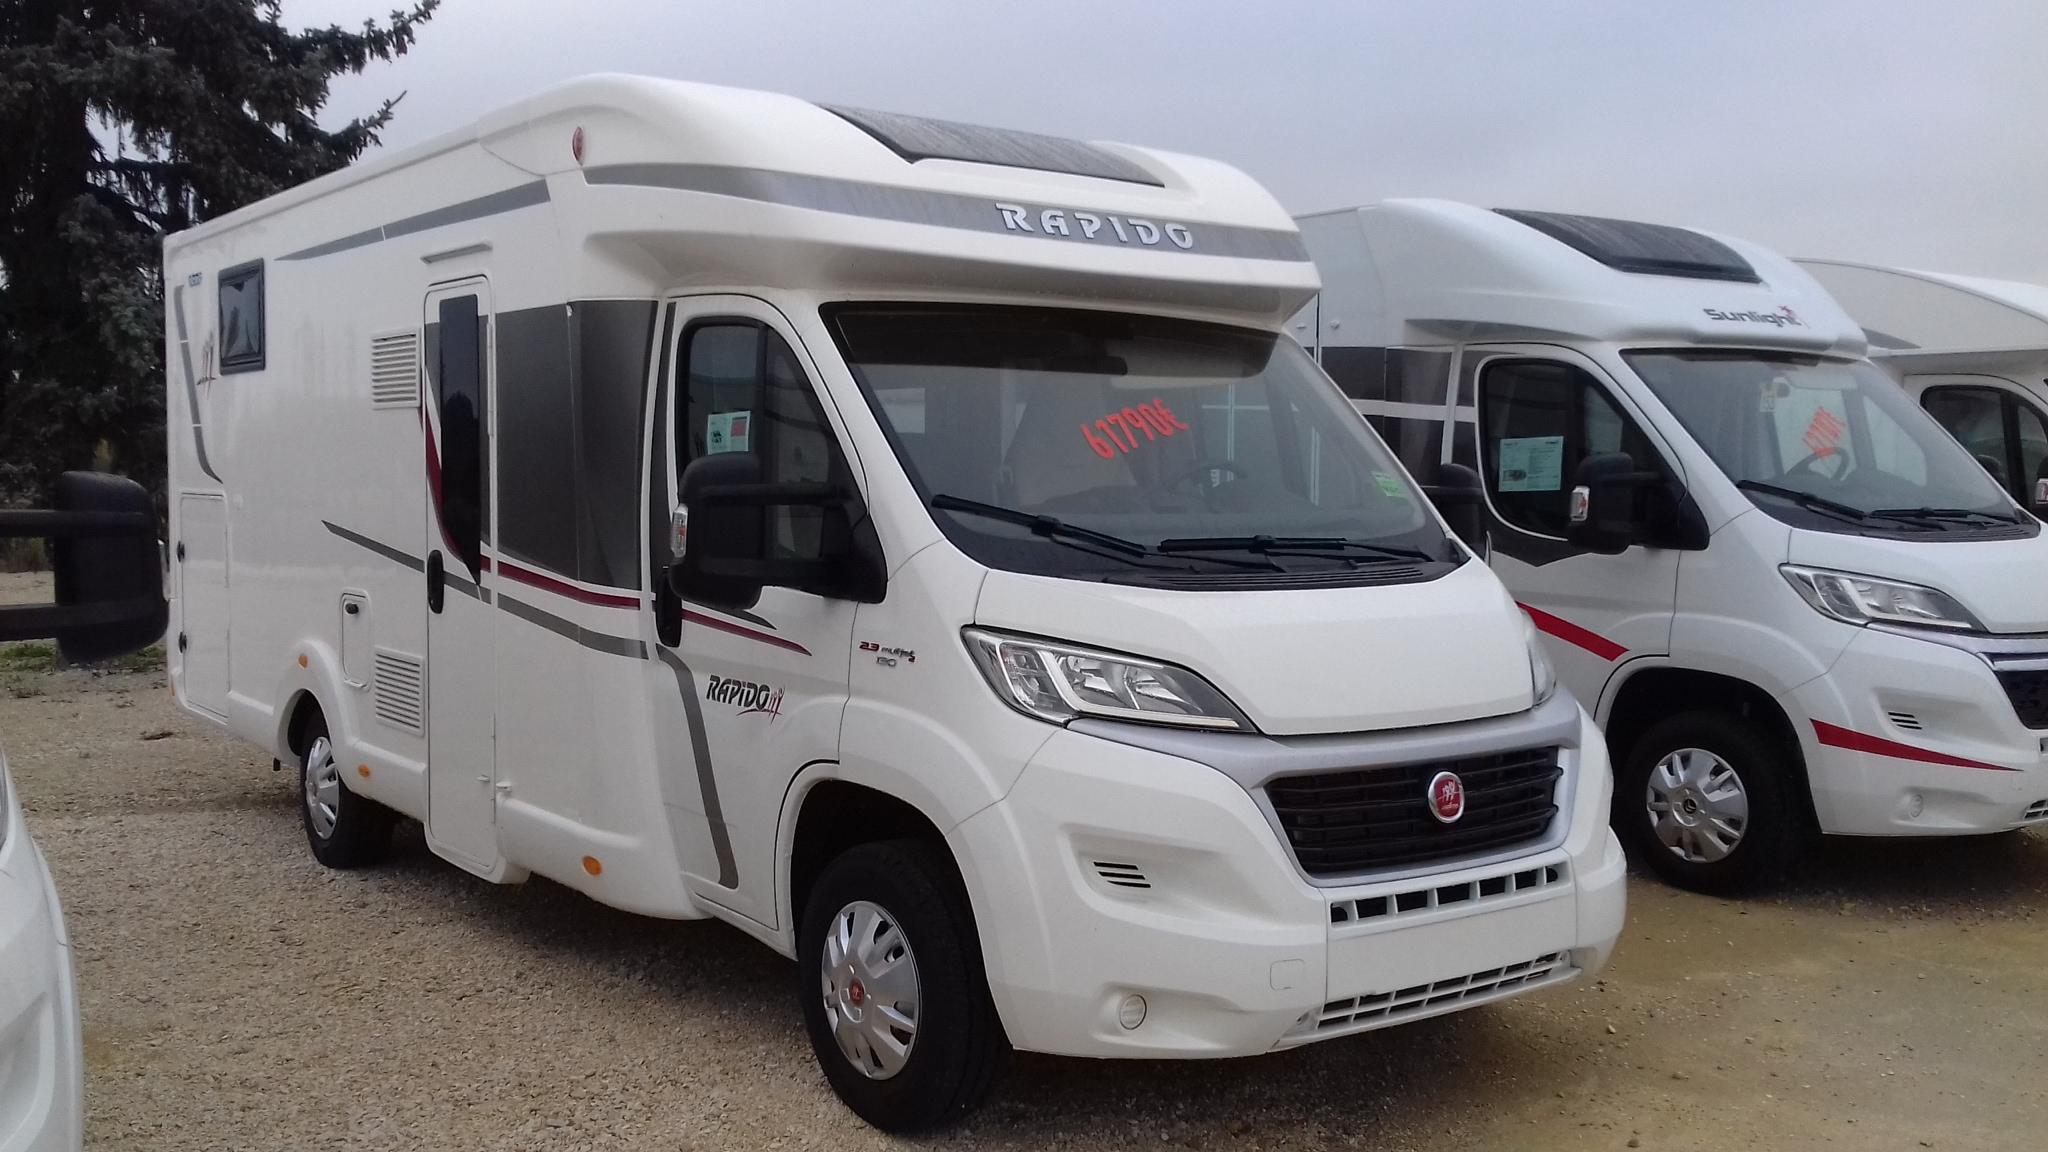 rapido 650 f neuf de 2018 fiat camping car en vente appoigny yonne 89. Black Bedroom Furniture Sets. Home Design Ideas